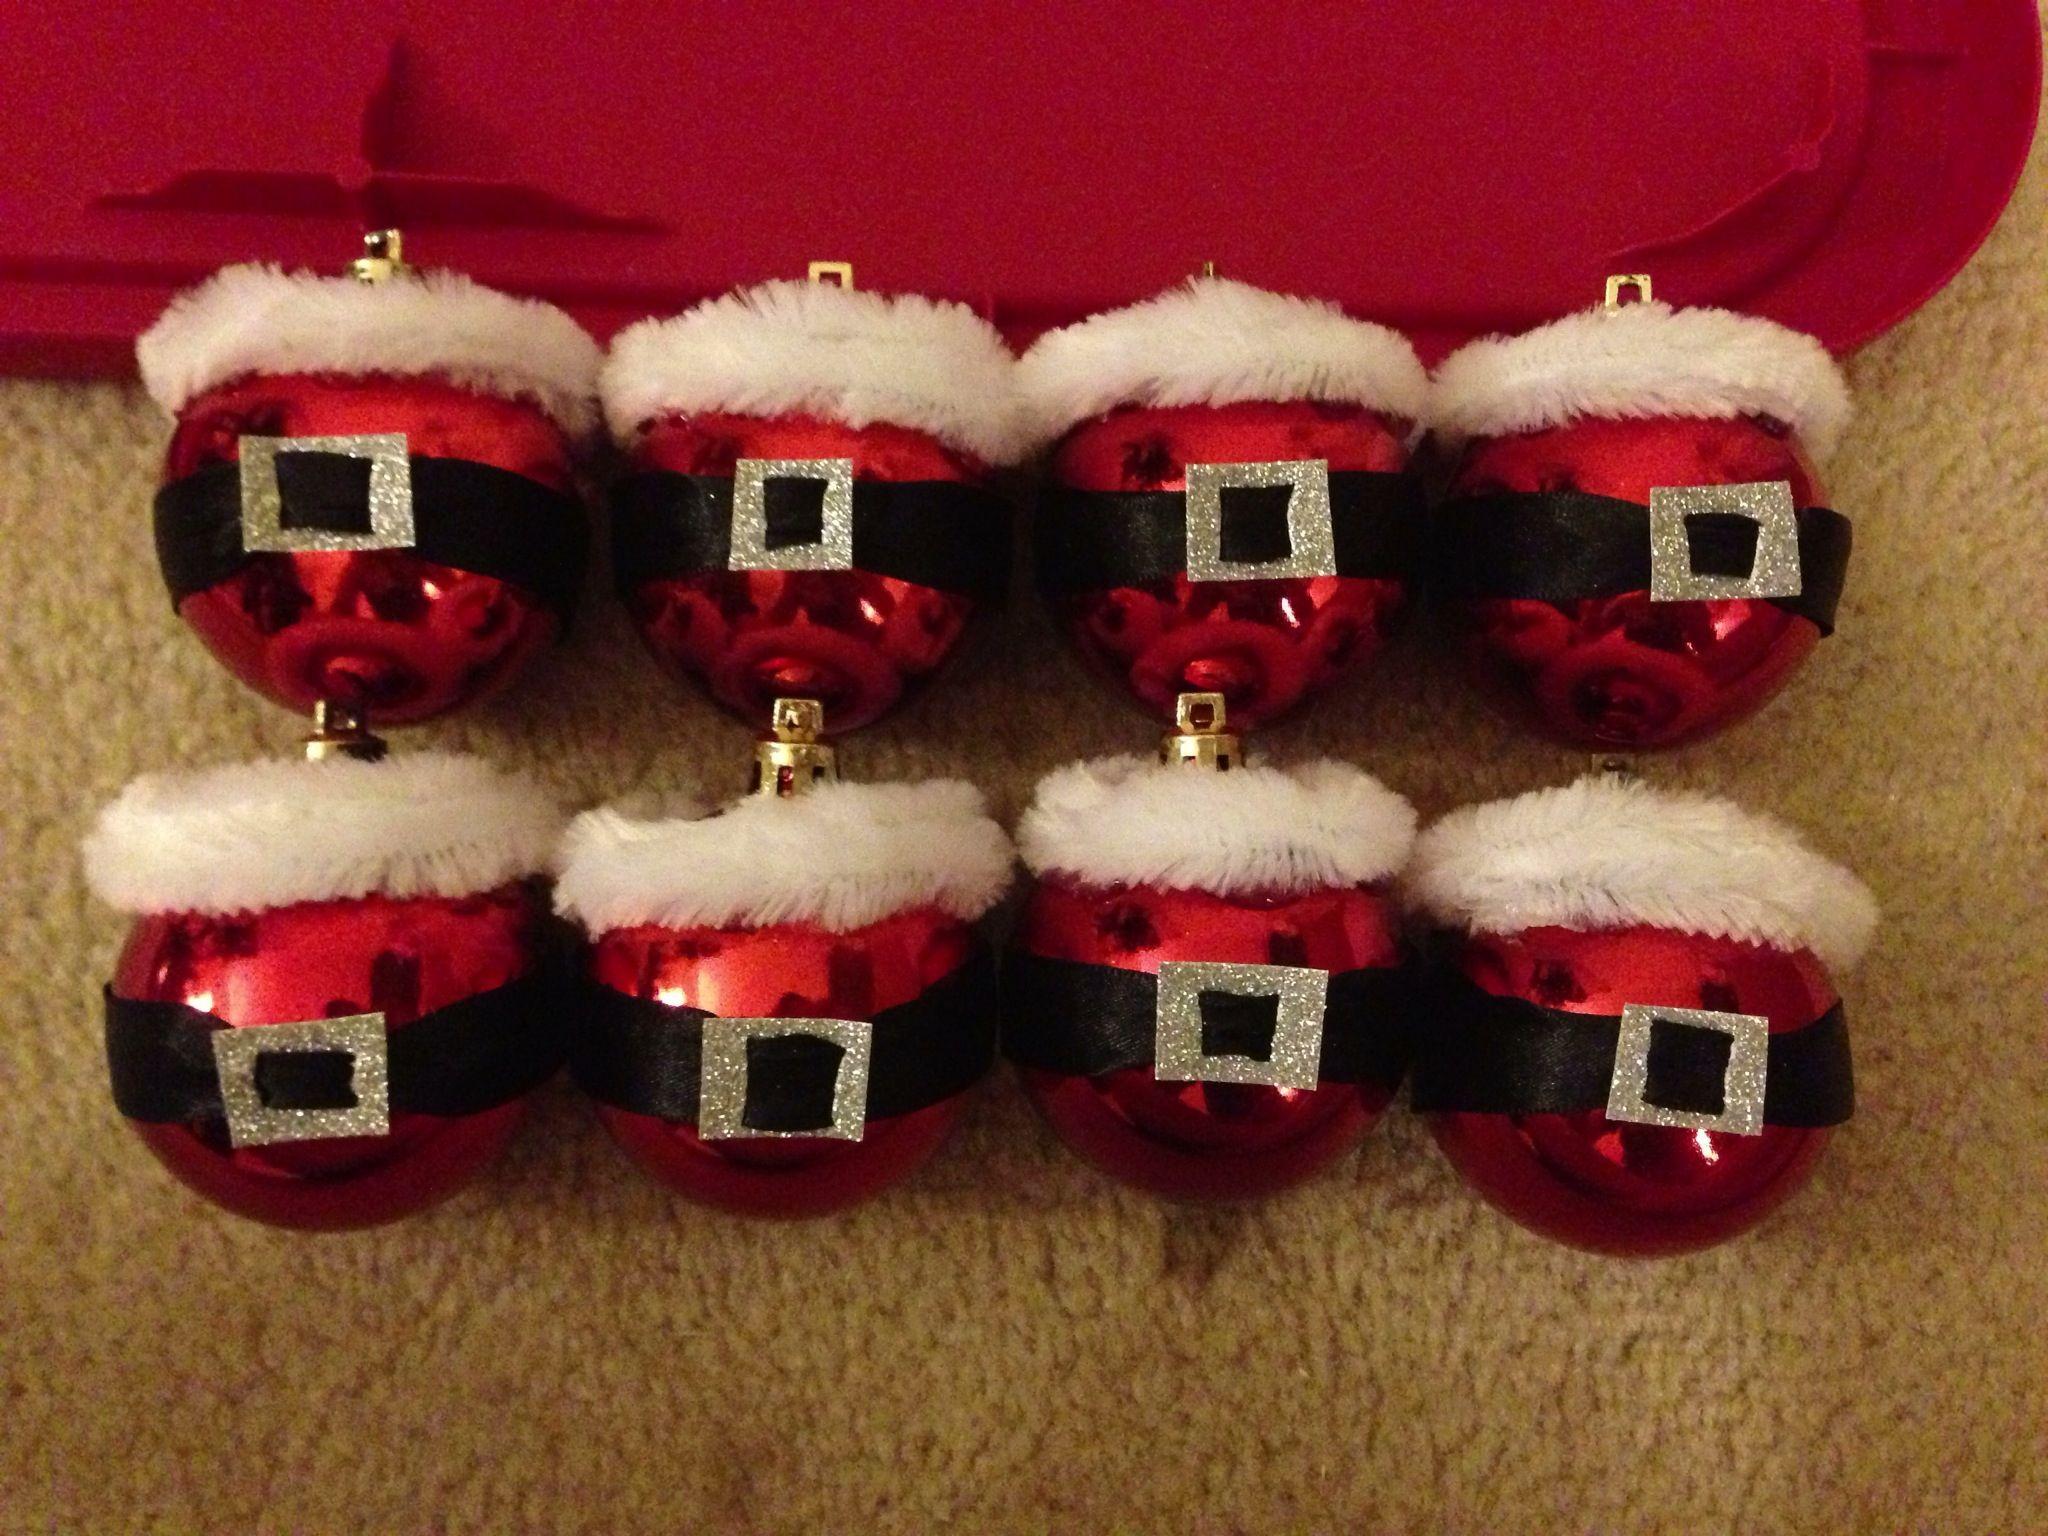 santa ornaments plain red dollar store ornaments black ribbon for the belt sparkly - Santa Claus Belt